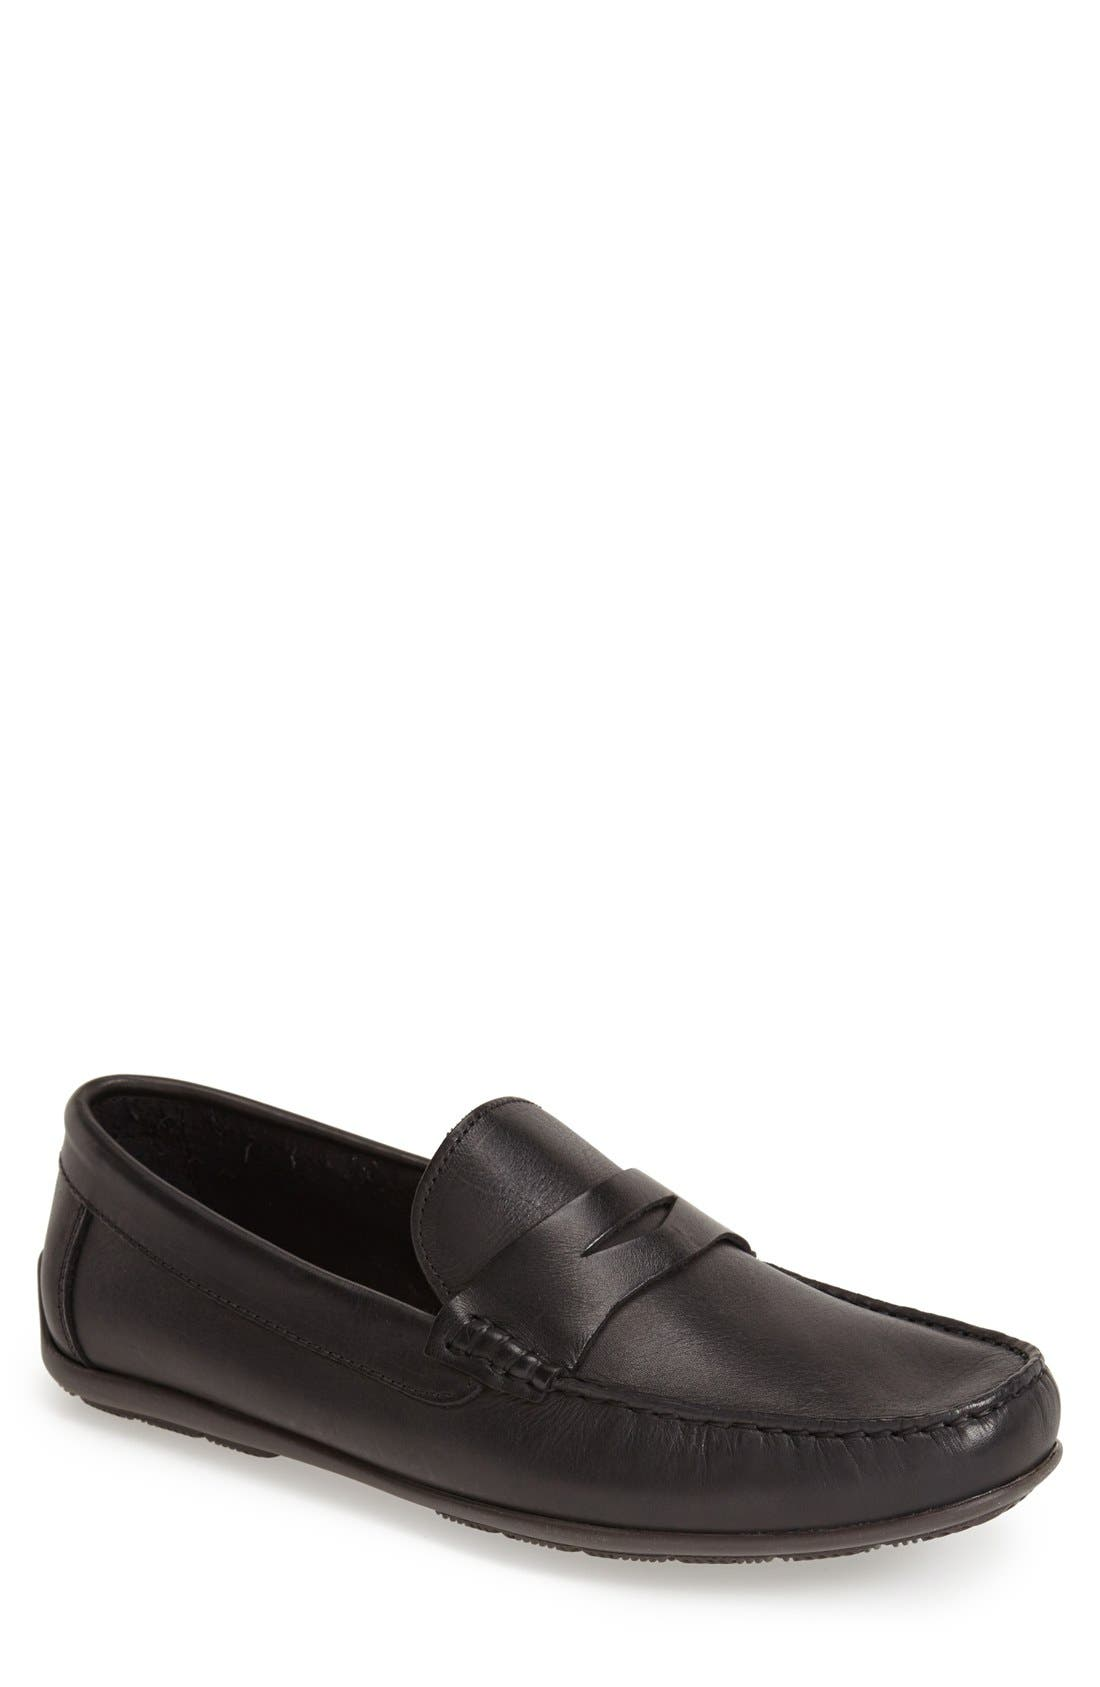 'Paris' Leather Penny Loafer, Main, color, BLACK